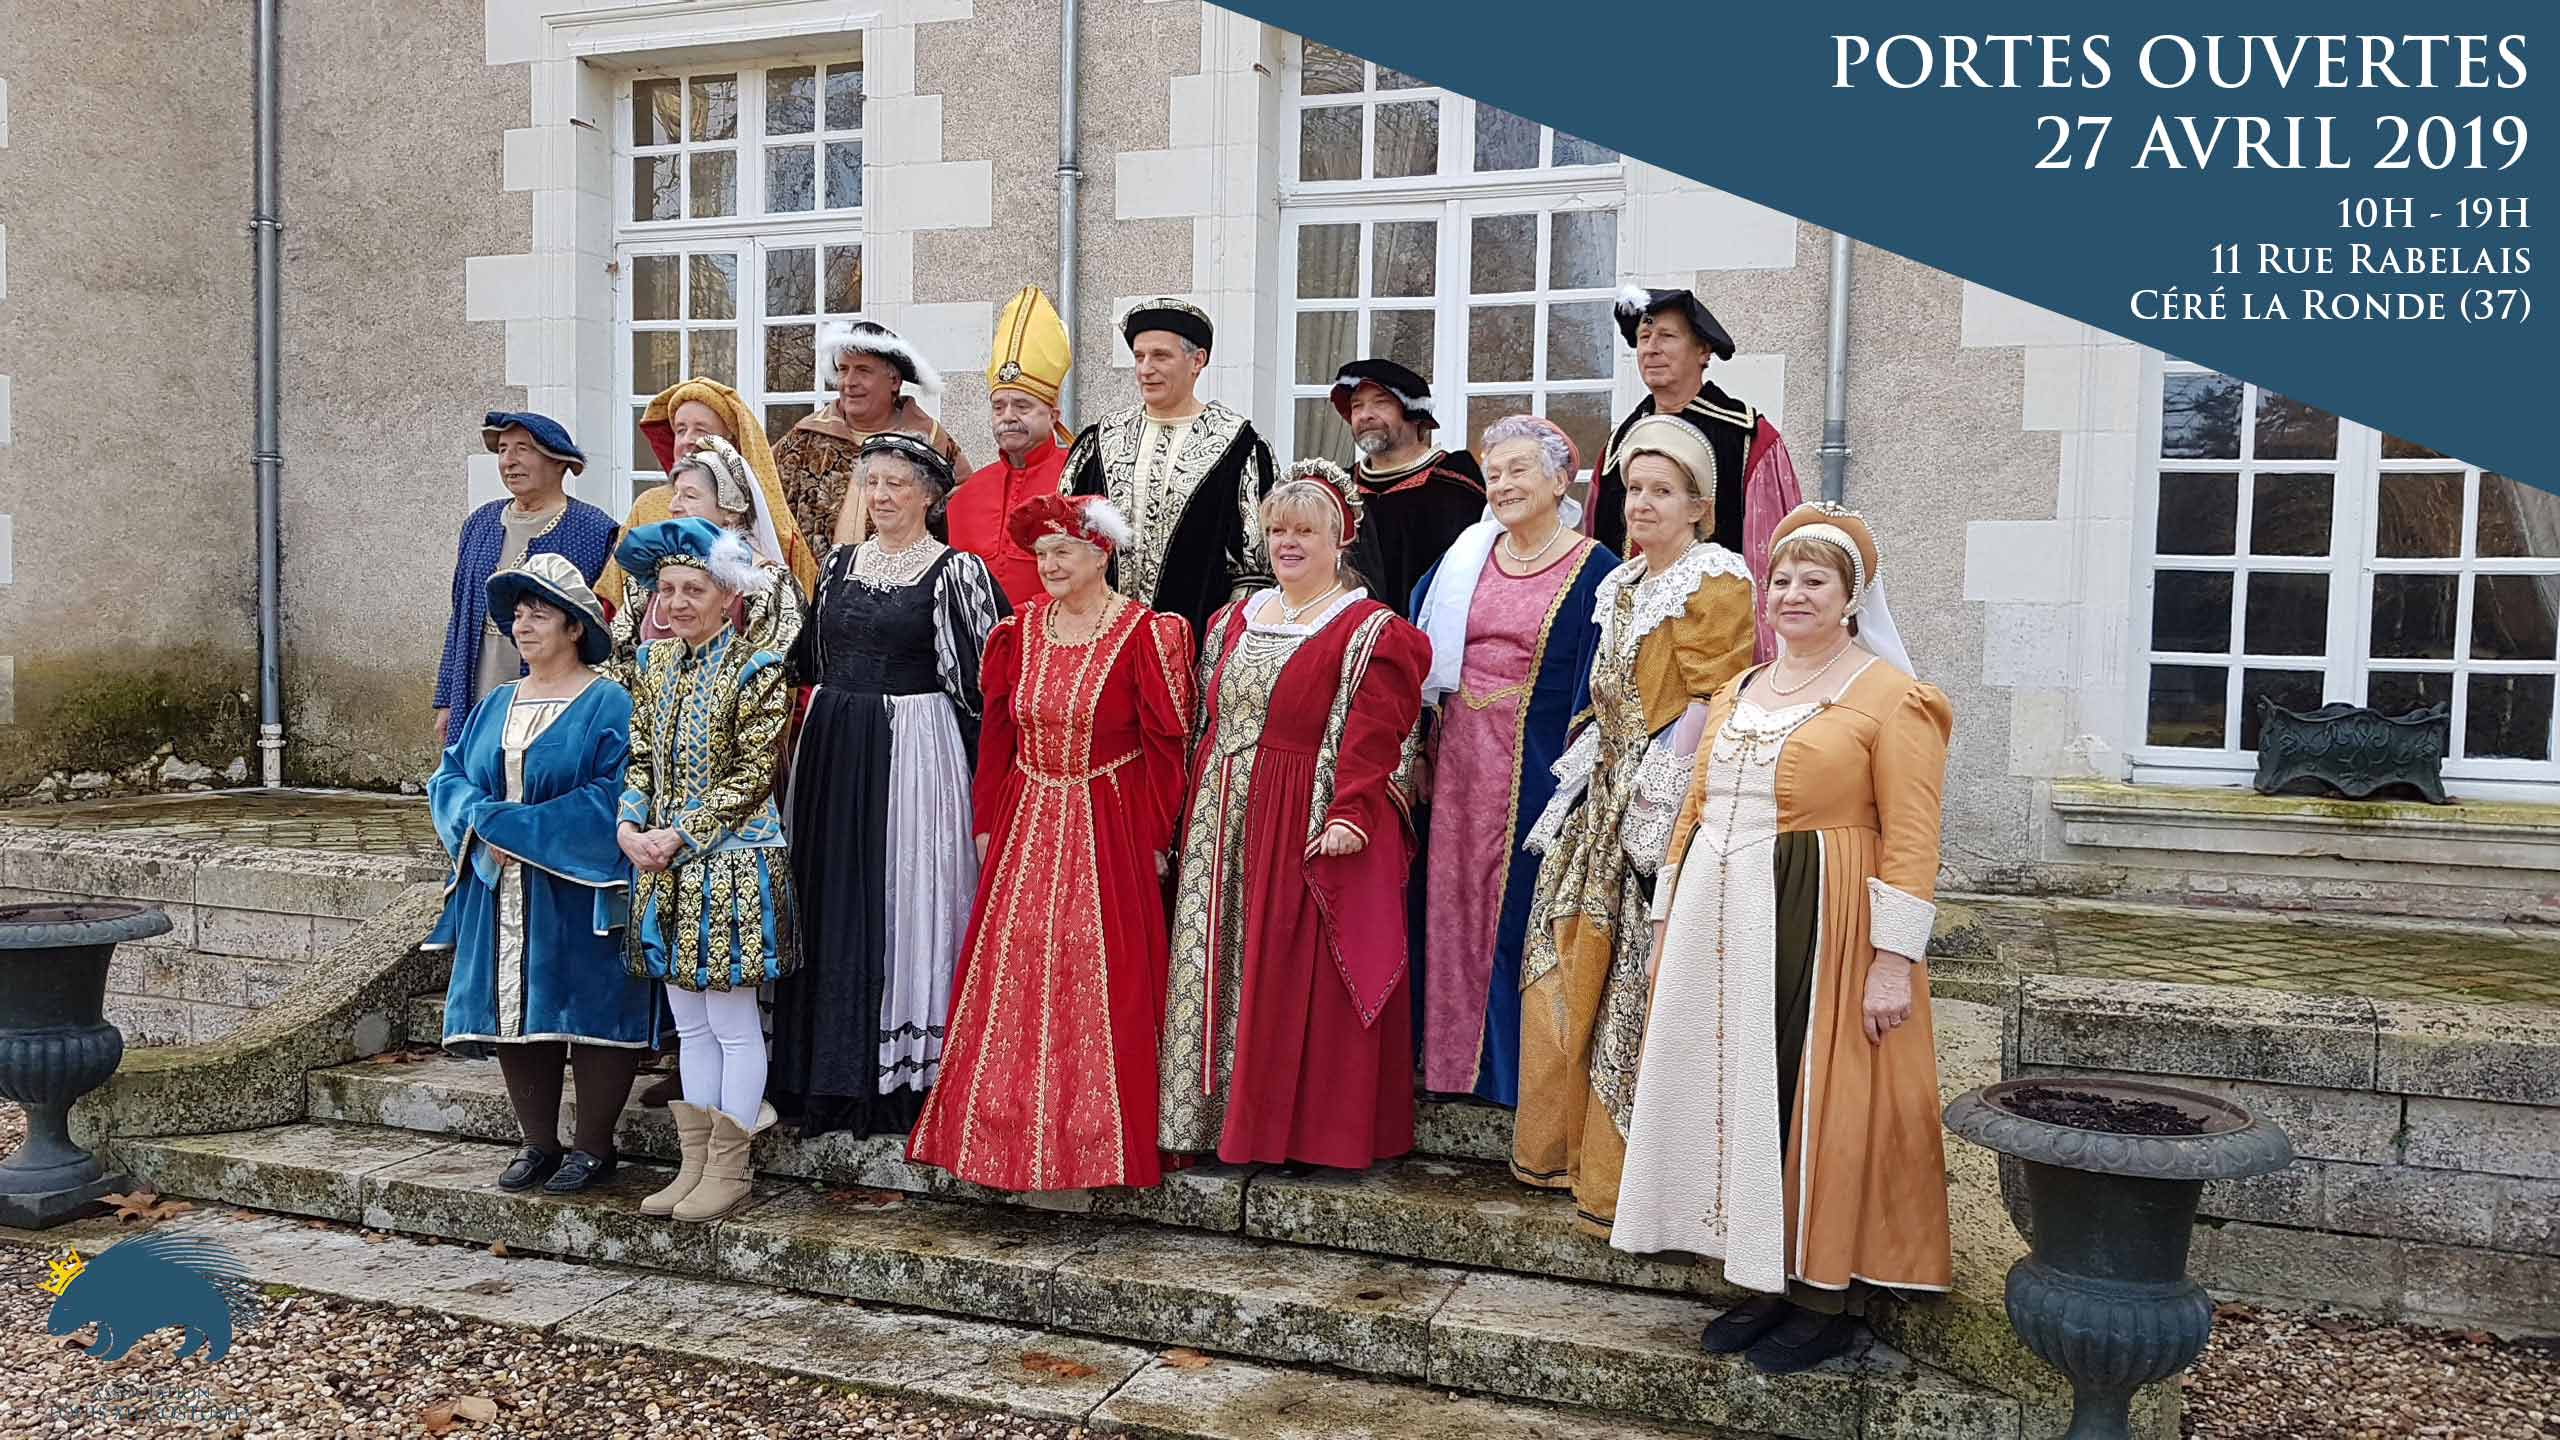 portes ouvertes Louis XII Costumes